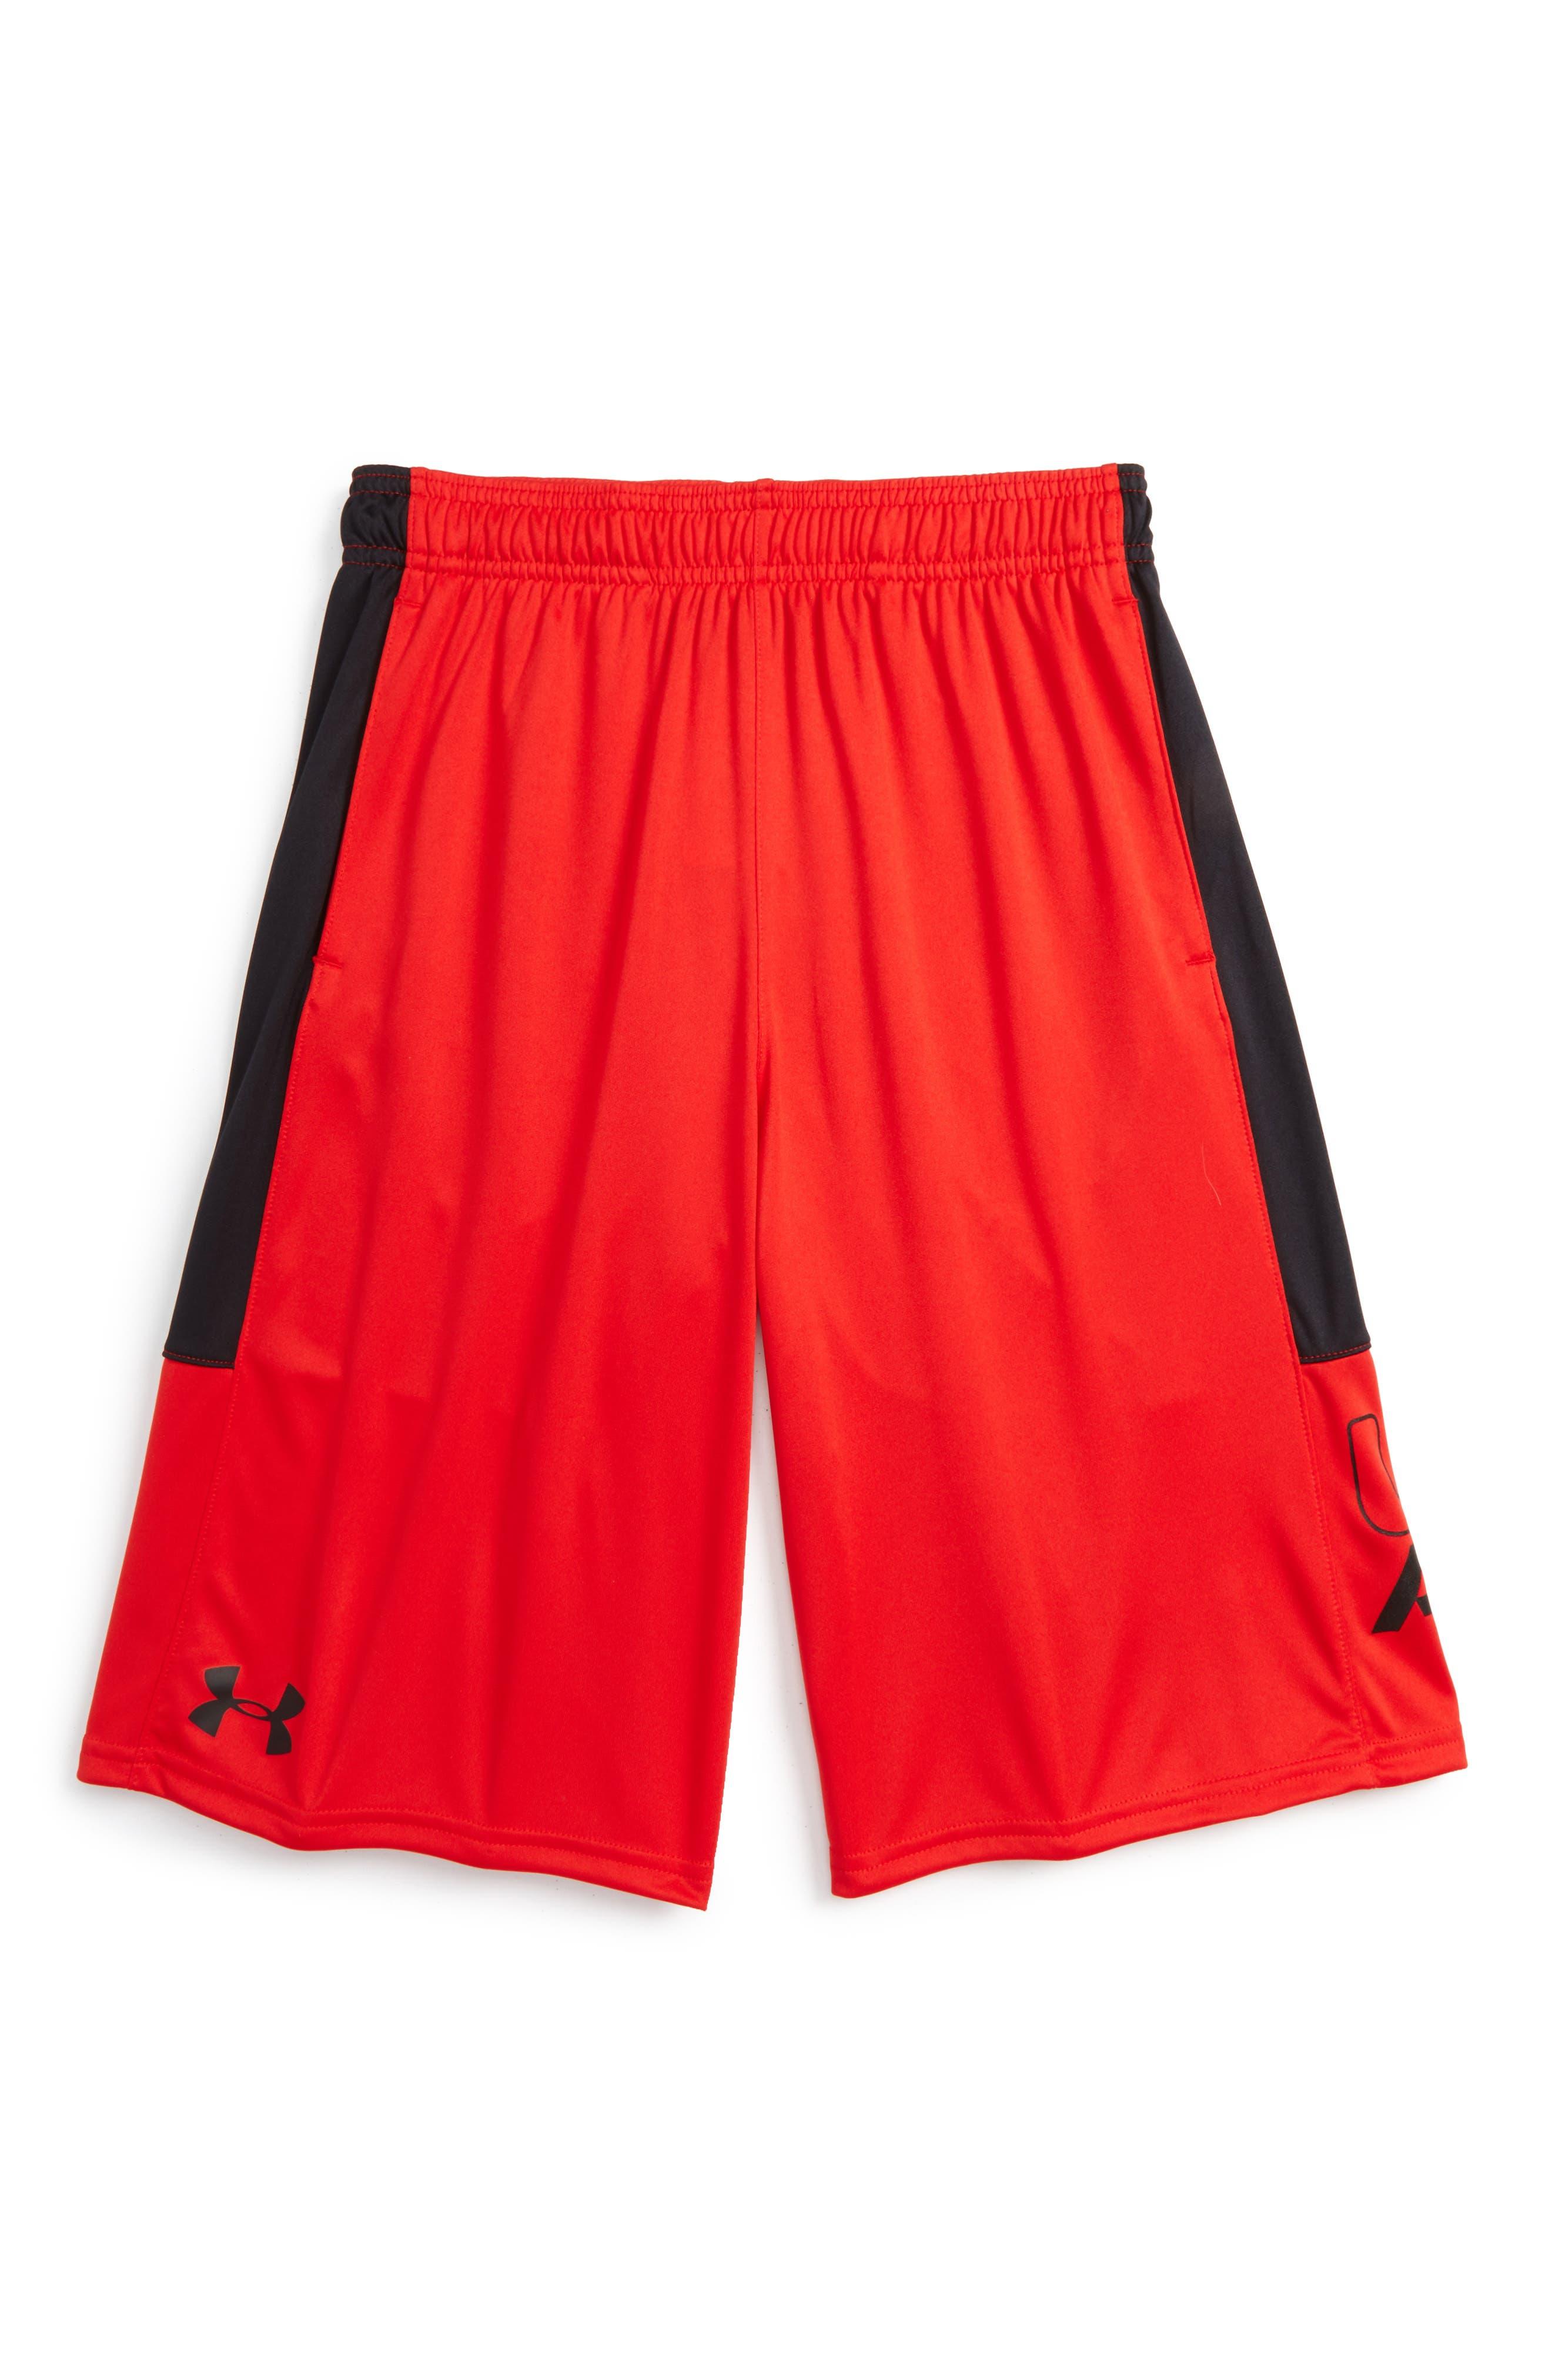 Stunt HeatGear<sup>®</sup> Shorts,                             Main thumbnail 1, color,                             Red/Black/Black